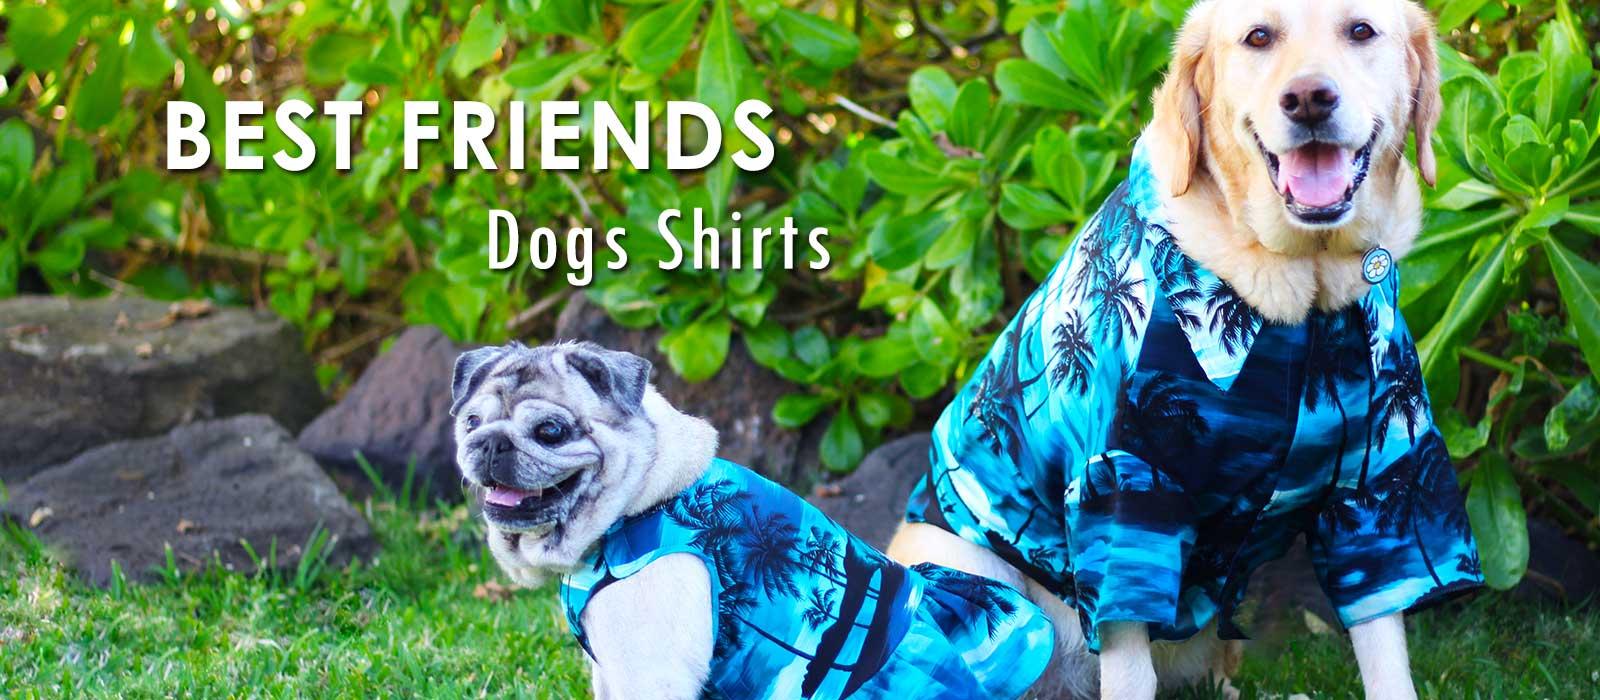 Dog's Aloha Shirts